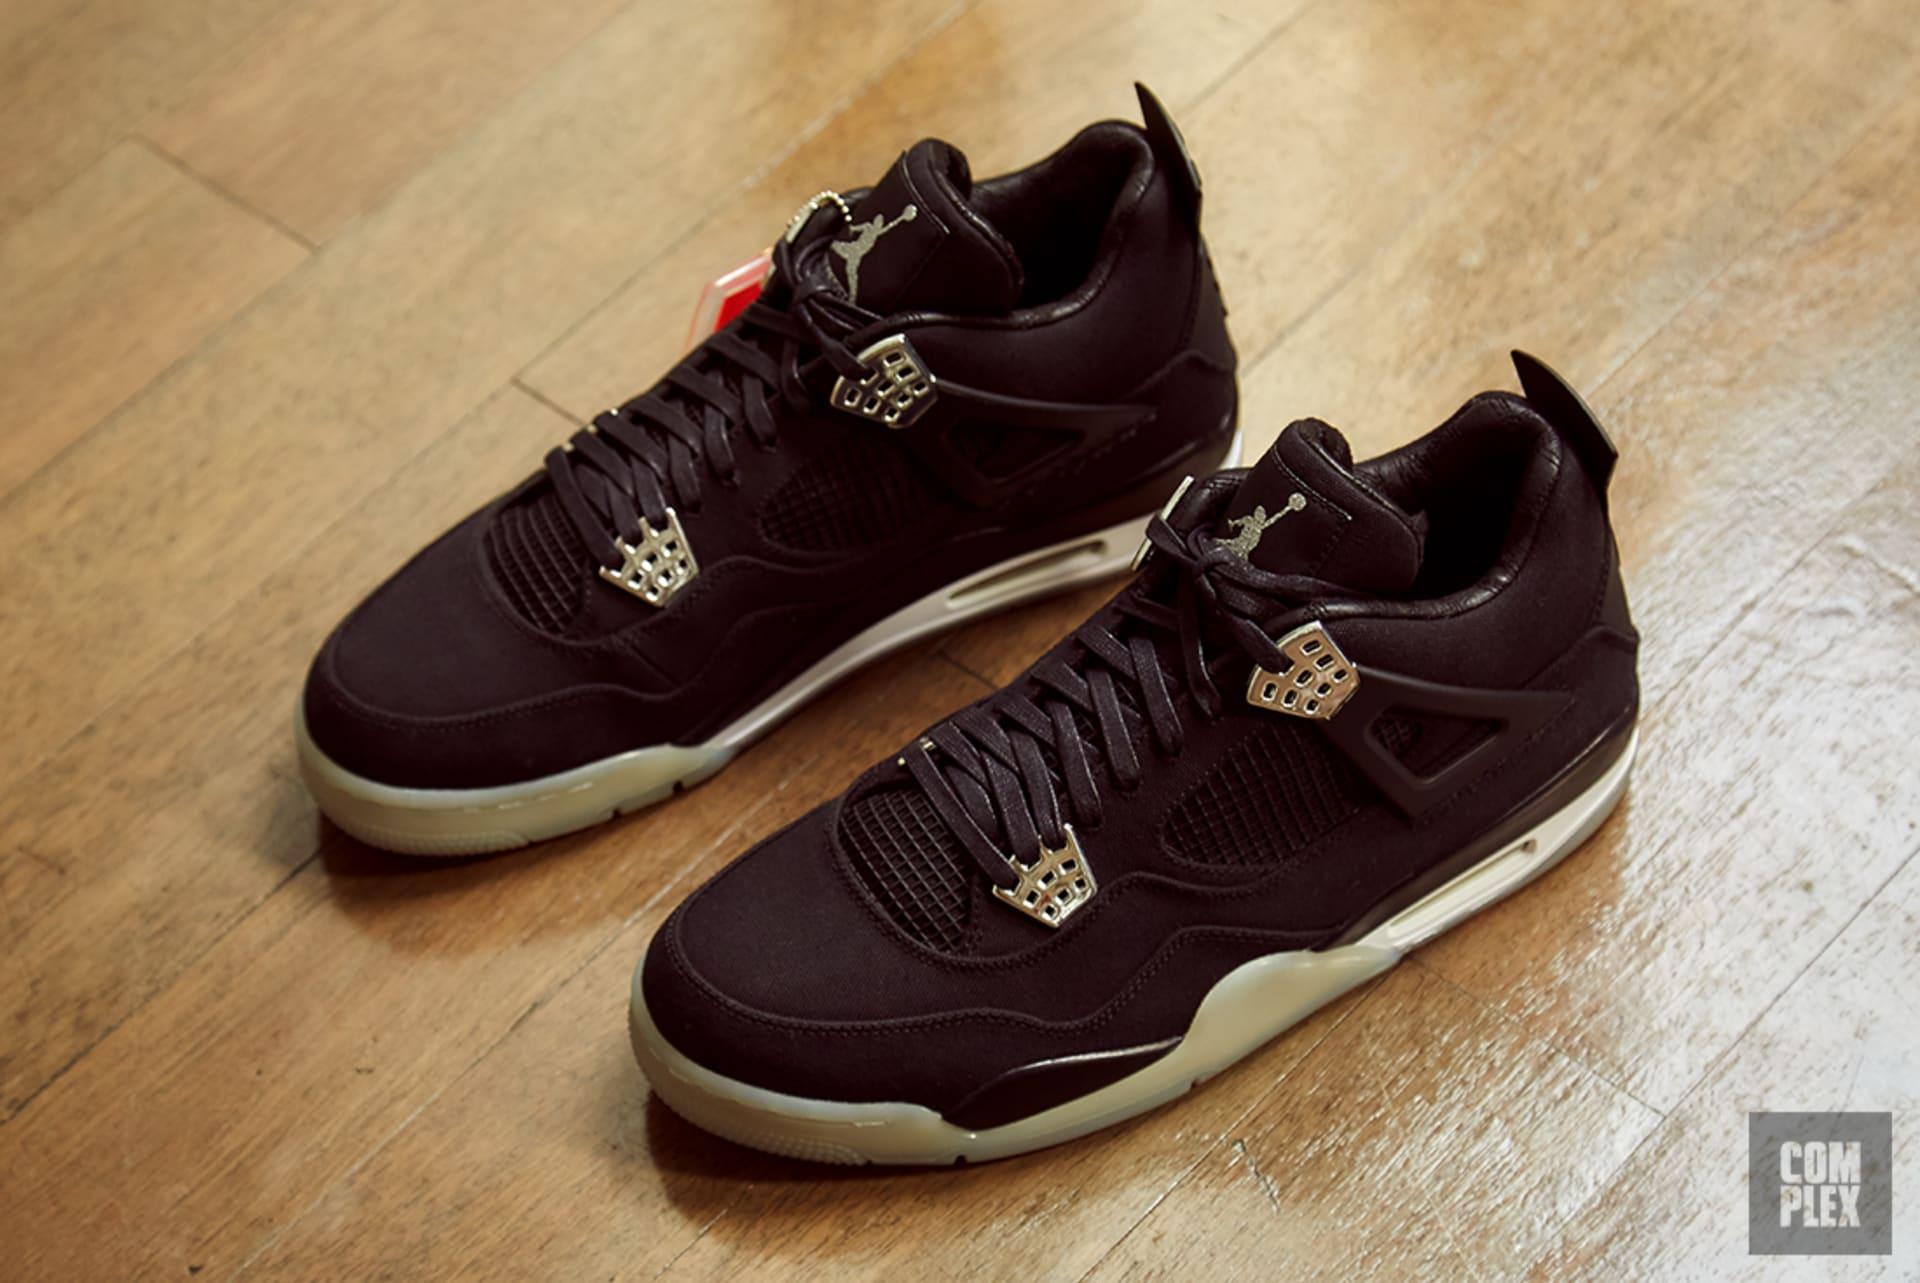 check out 2f5ce a9b26 Eminem Air Jordan 4 Carhartt